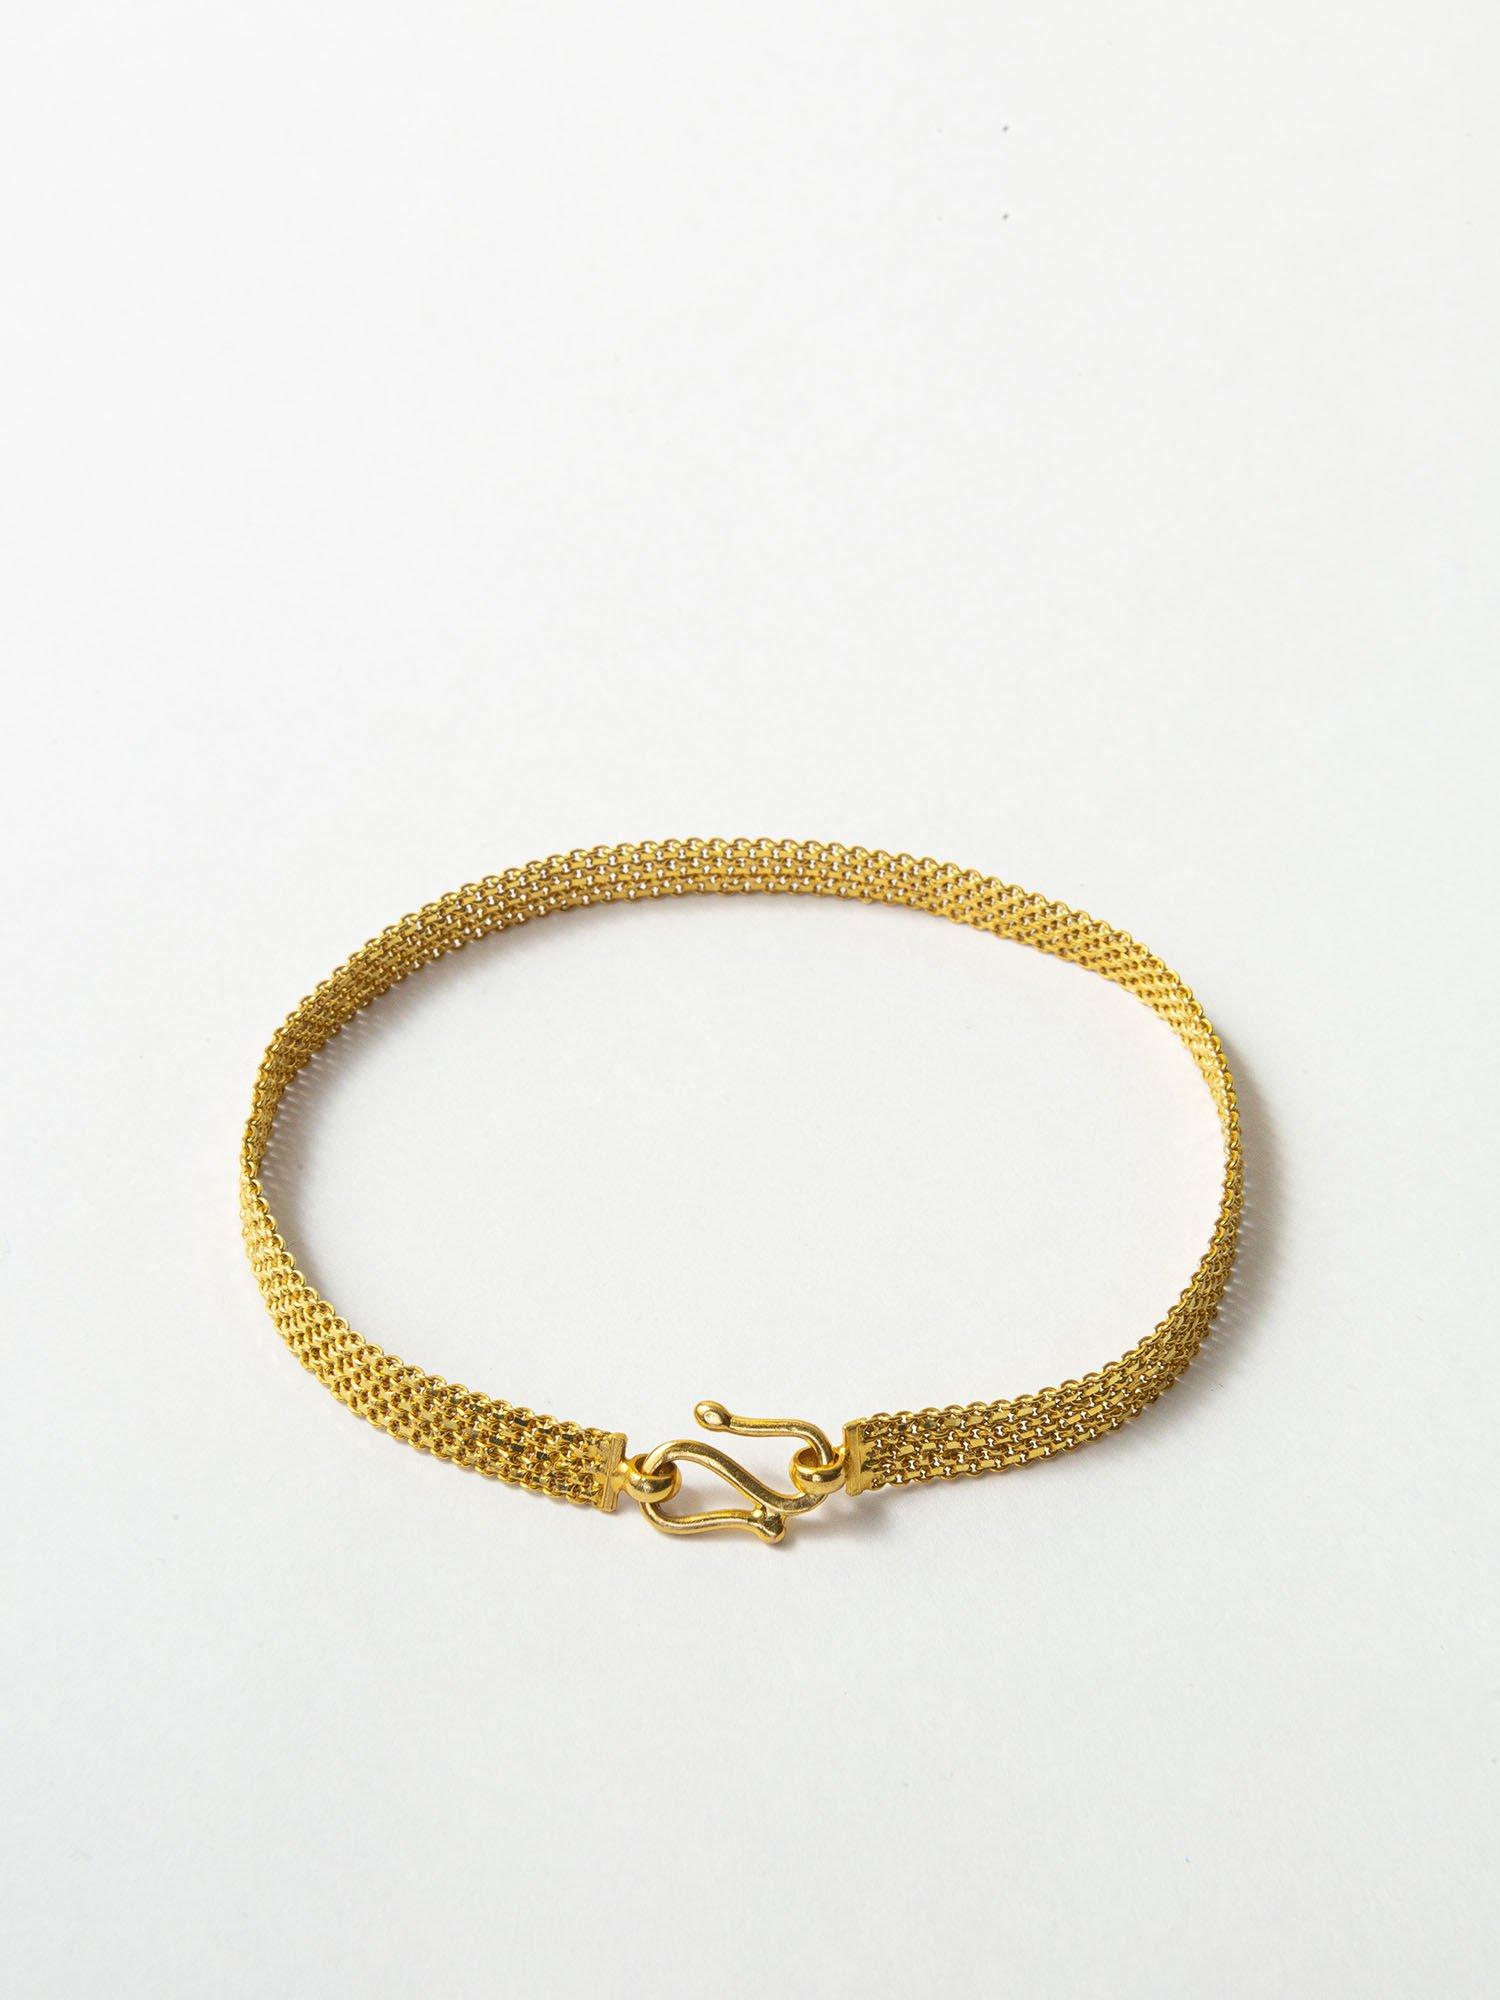 HELIOS / Chain kitting bracelet